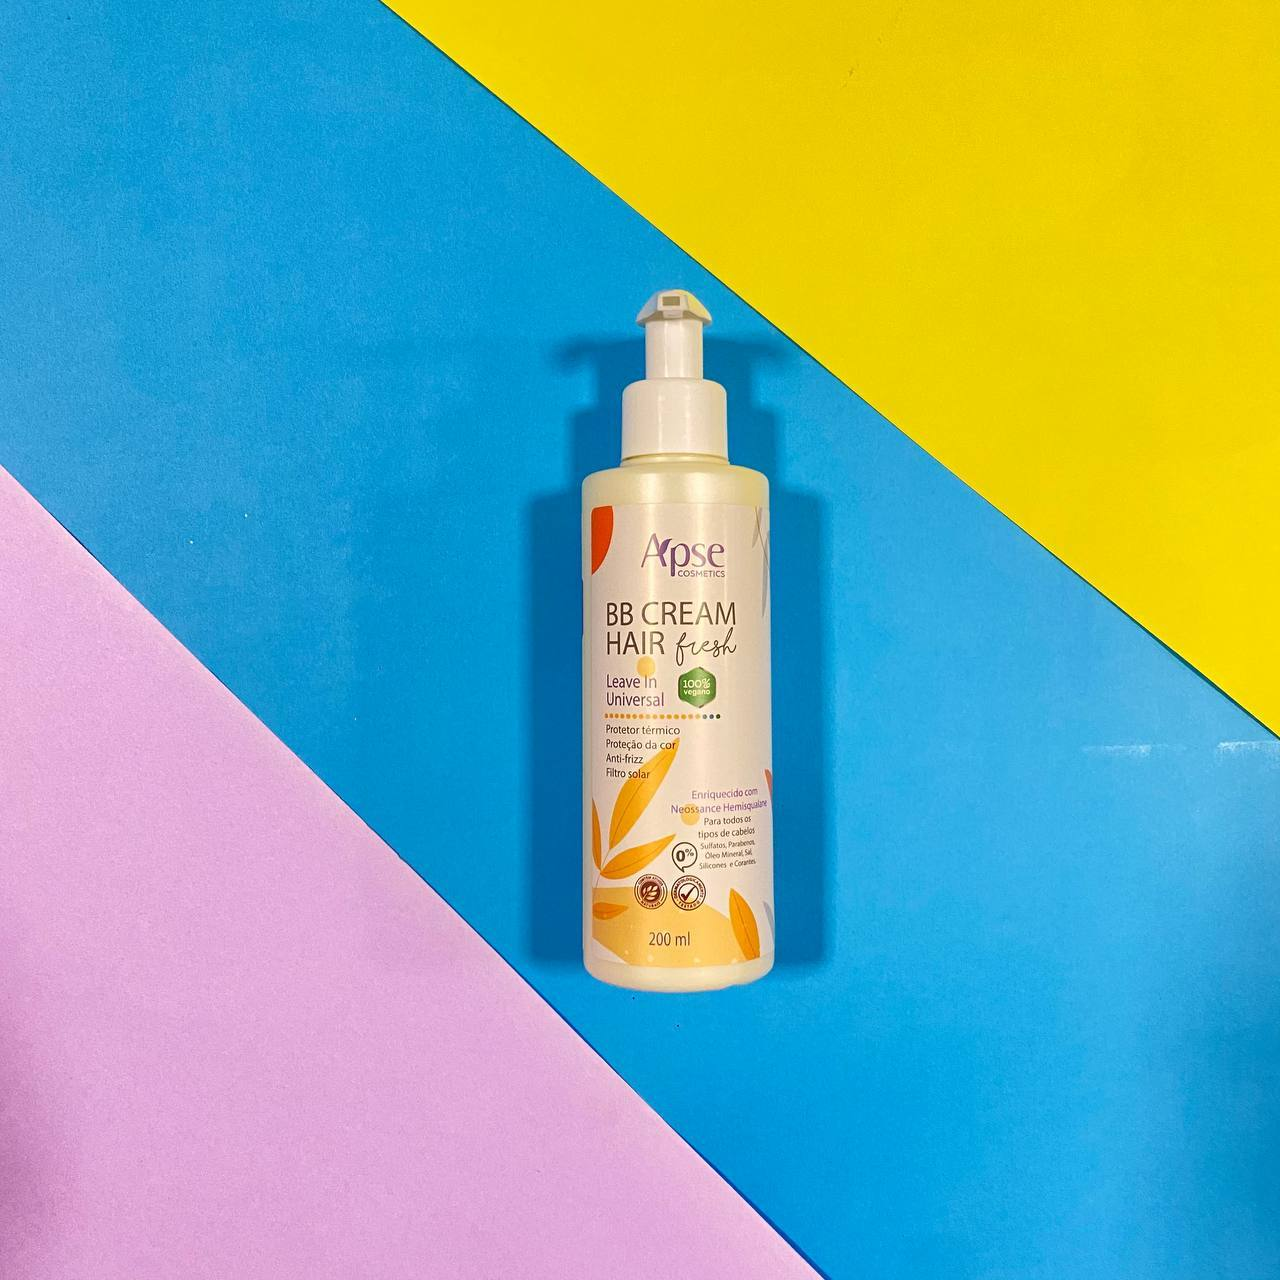 BB Cream Hair Fresh- Leave in Universal - Apse Cosmetics 200ml